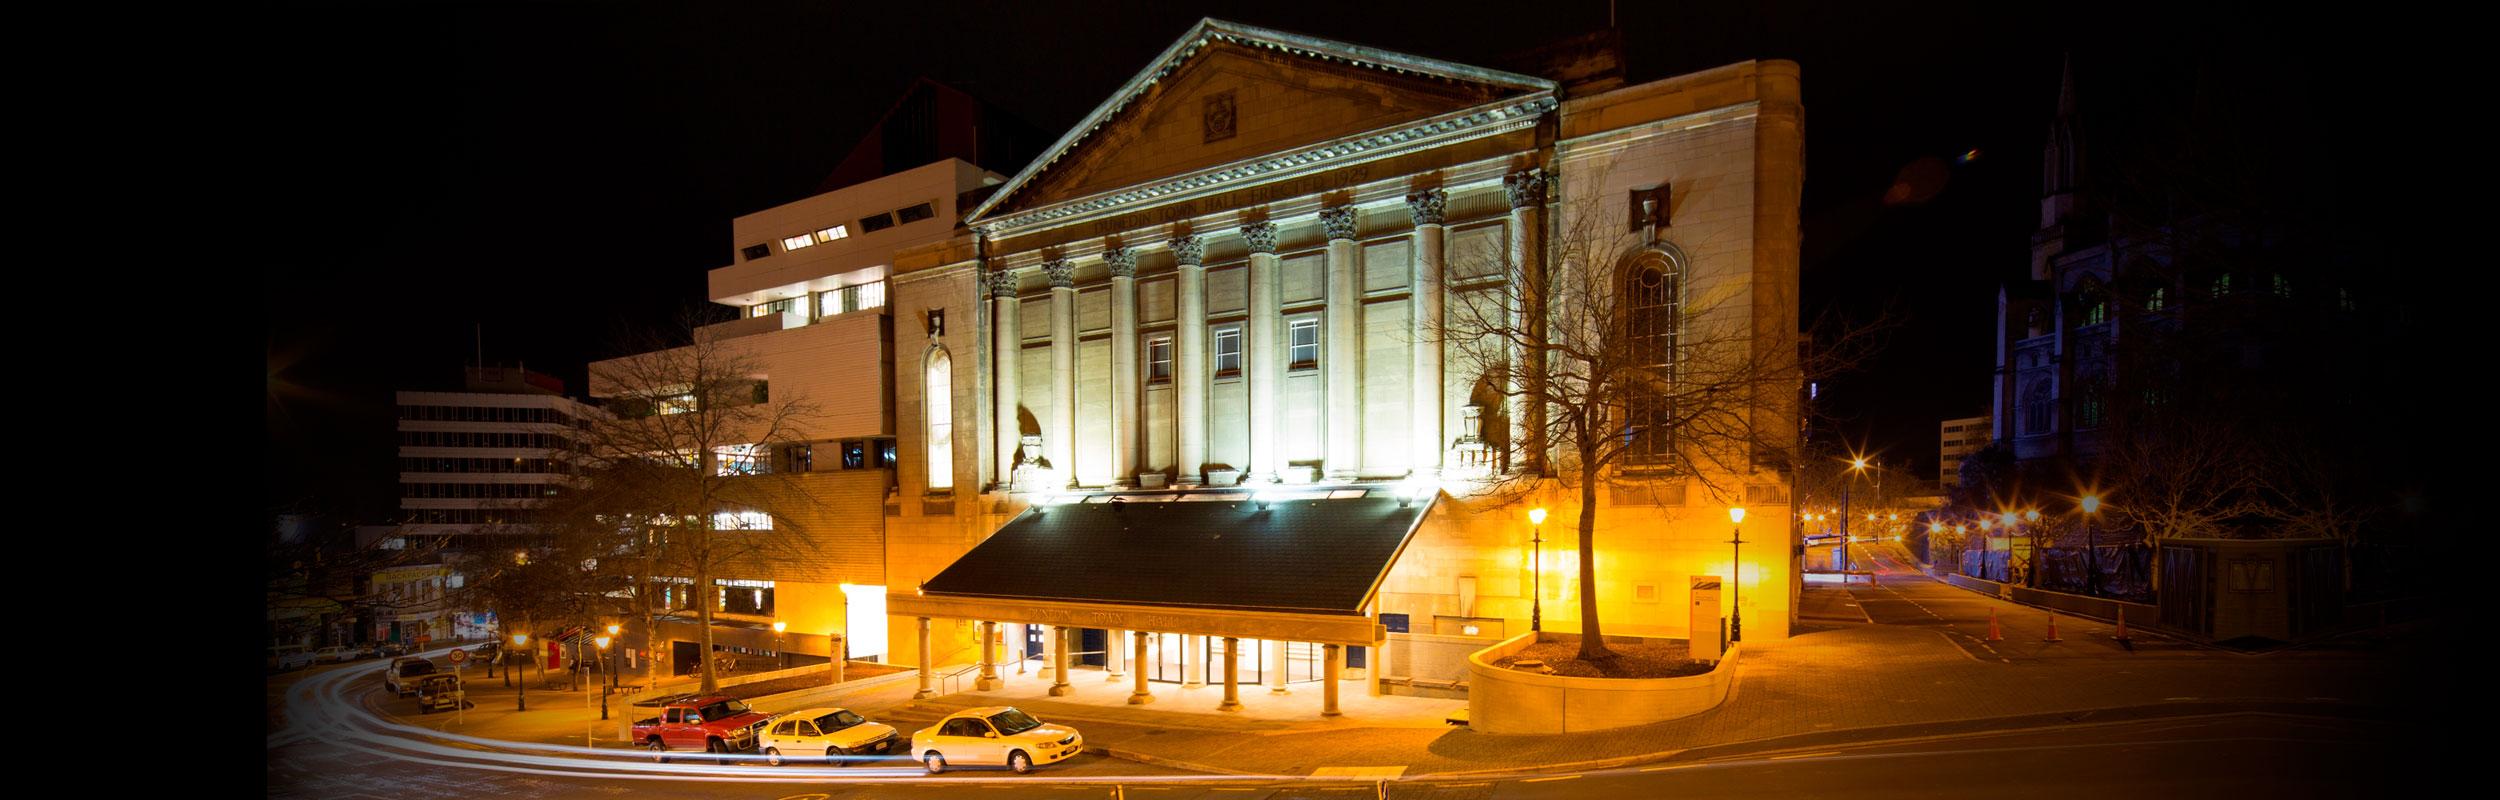 Dunedin Town Hall at night